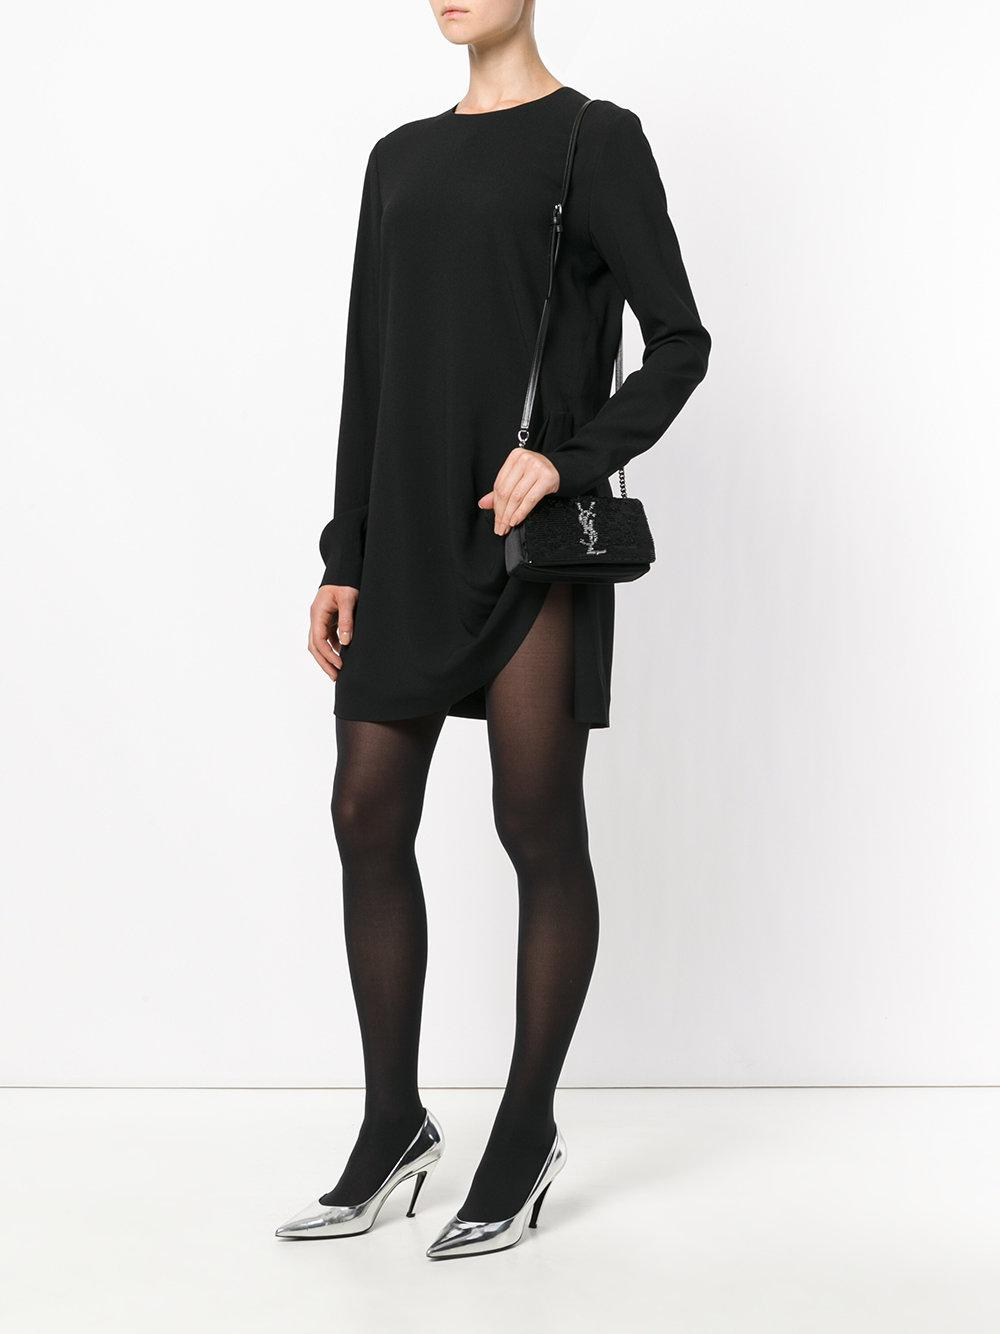 Lyst - Saint Laurent Toy West Hollywood Shoulder Bag in Black 67e77e0dfa